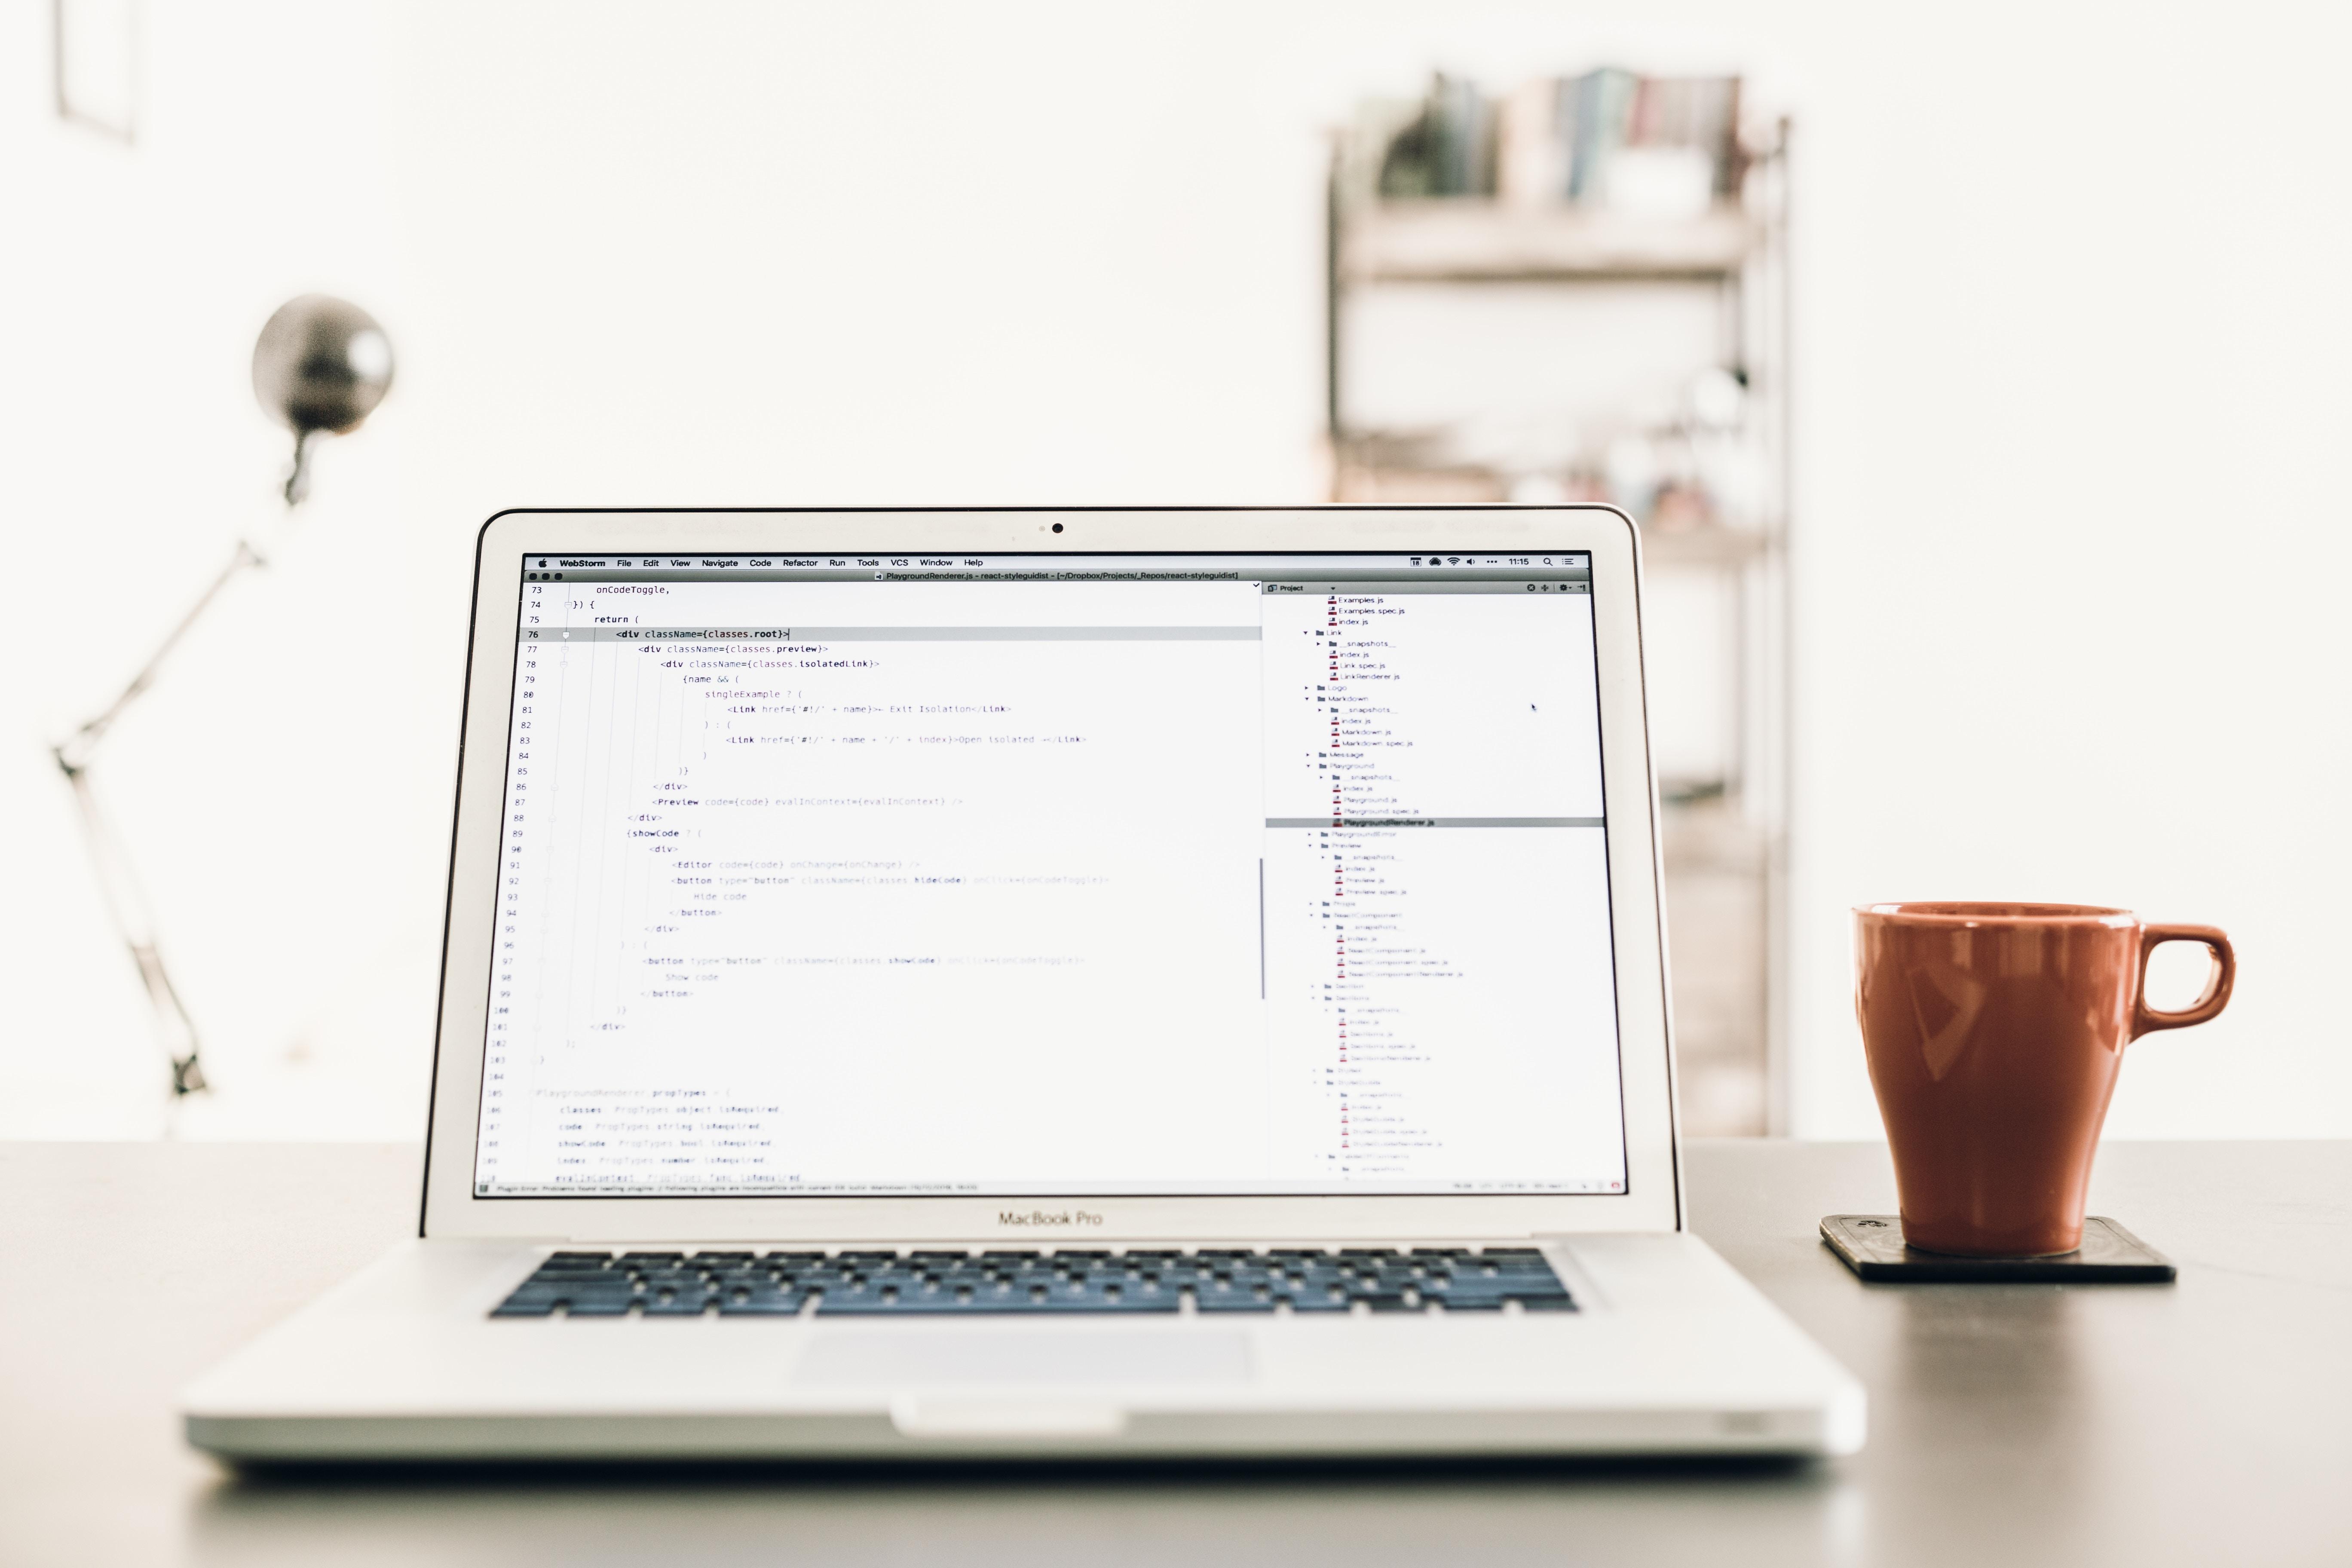 Open macbookPro on desk next to coffee mug